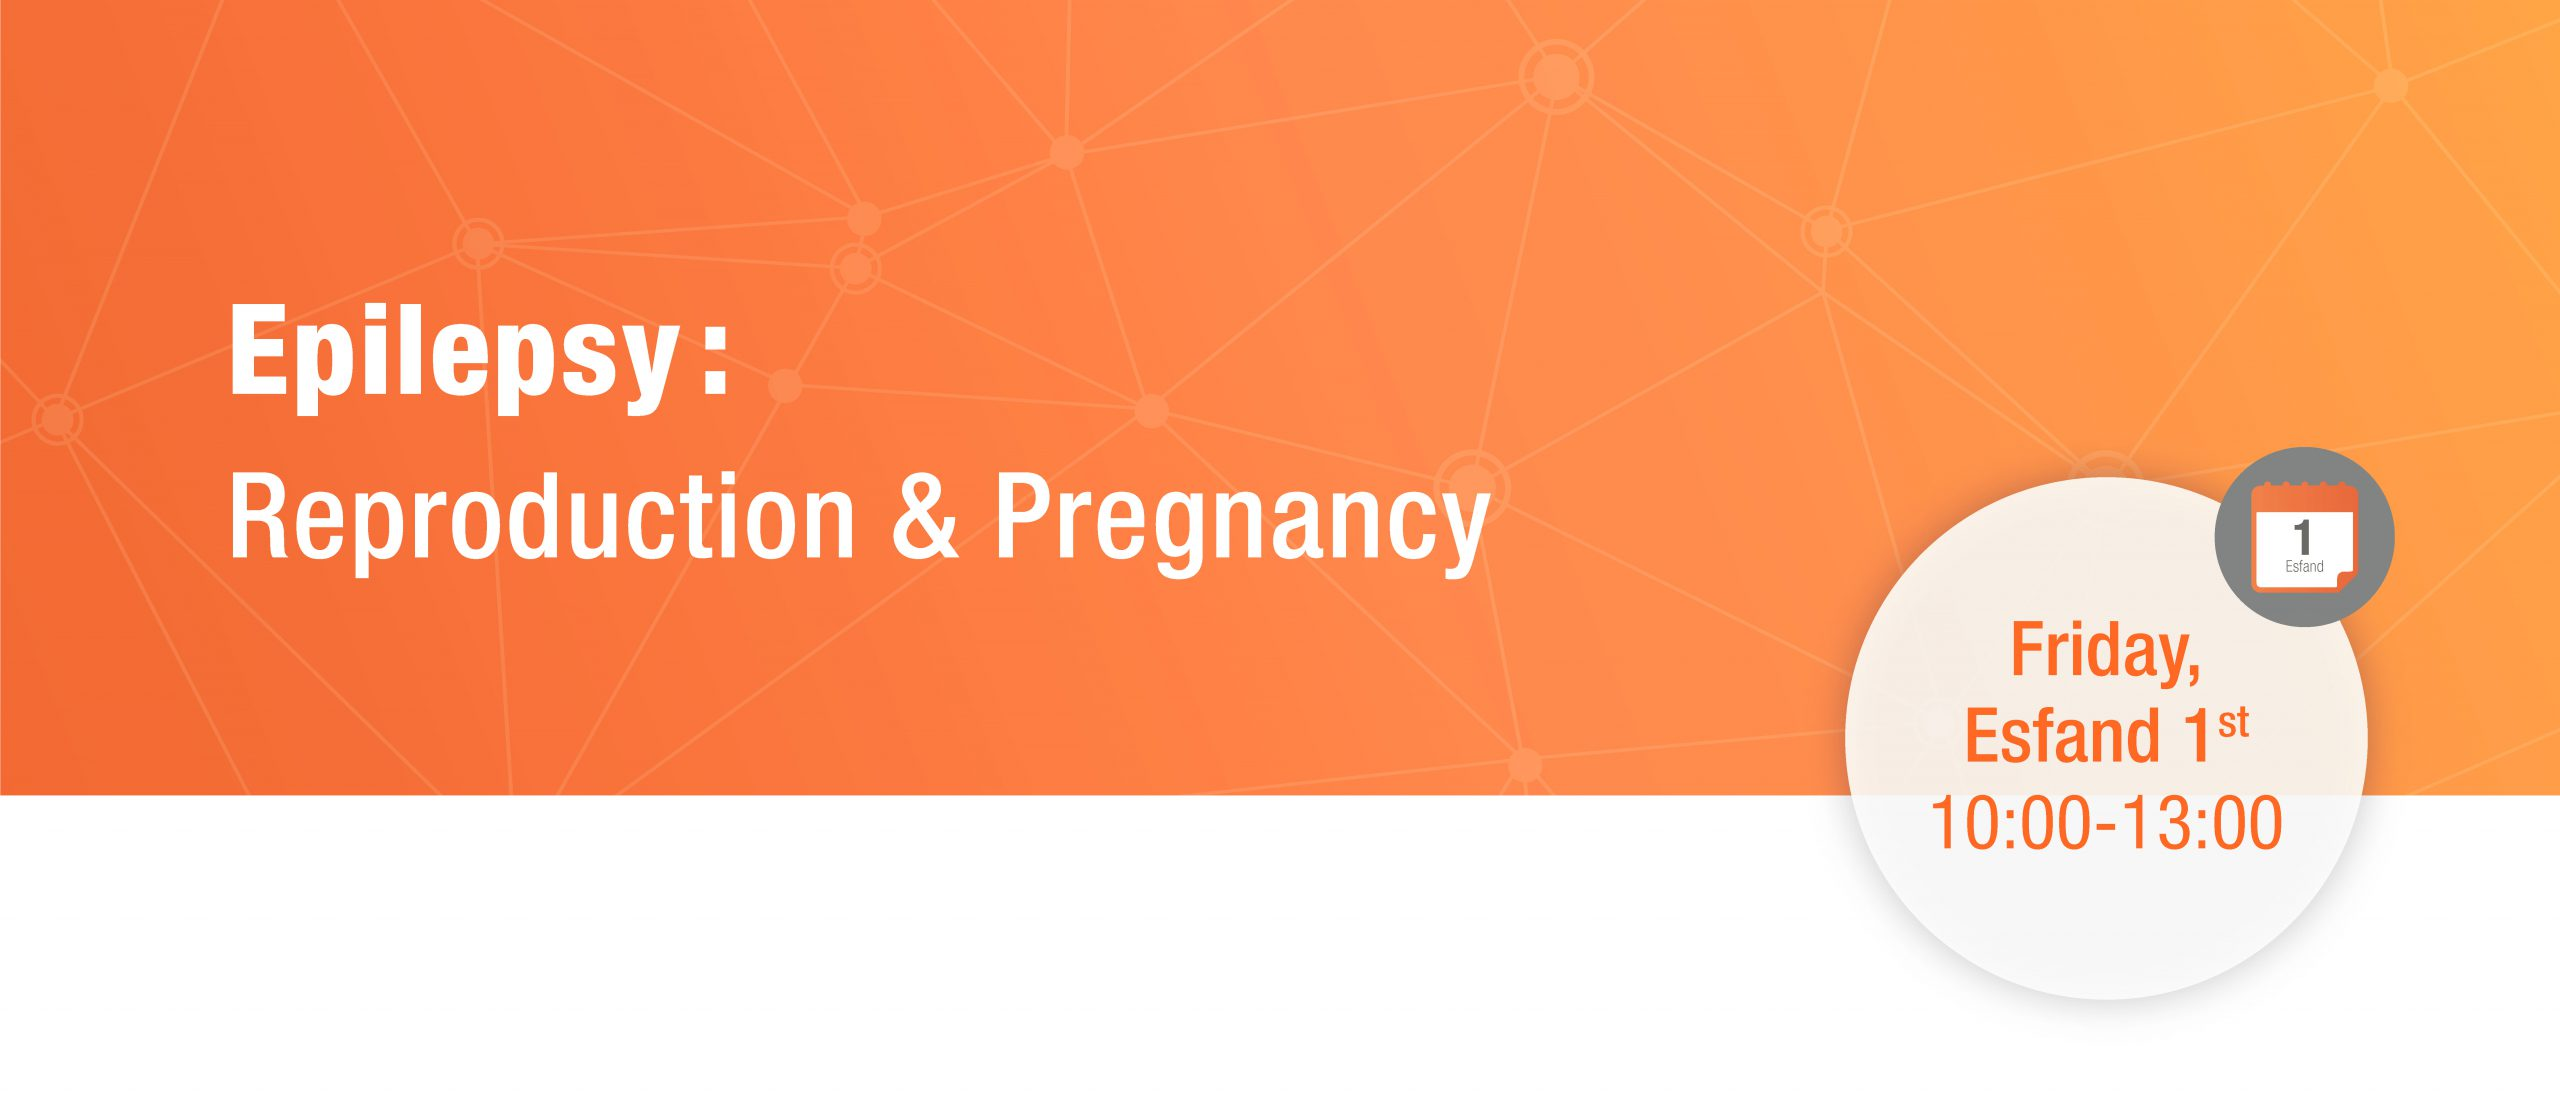 Epilepsy: Reproduction & Pregnancy